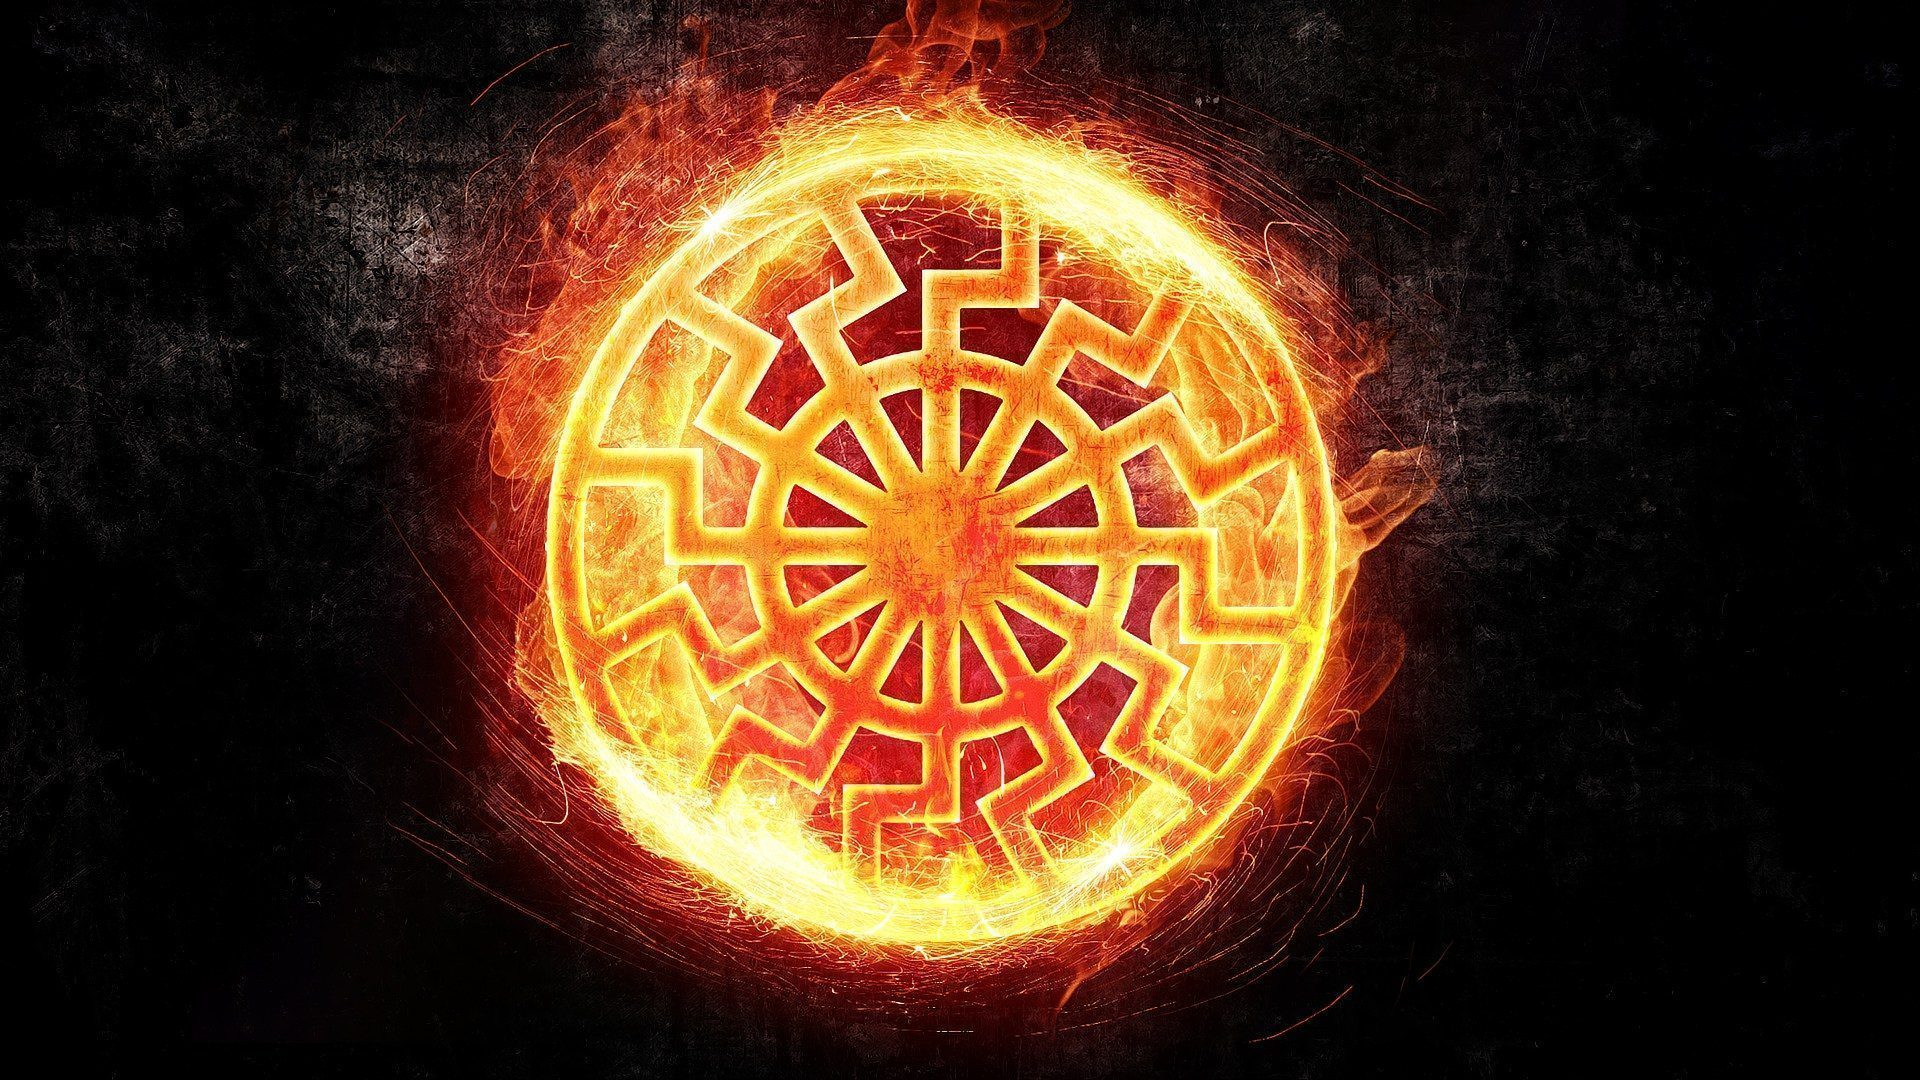 zzzzzzzzzzzzzzzzzzzzzzzzzzzzzzzzzzzzzzzzzzzzzzzzzzzzzzzzzzzzzzzzzzzzzzzzzzzzzzzzzblack-sun-a-black-sun-fire-structure-sign